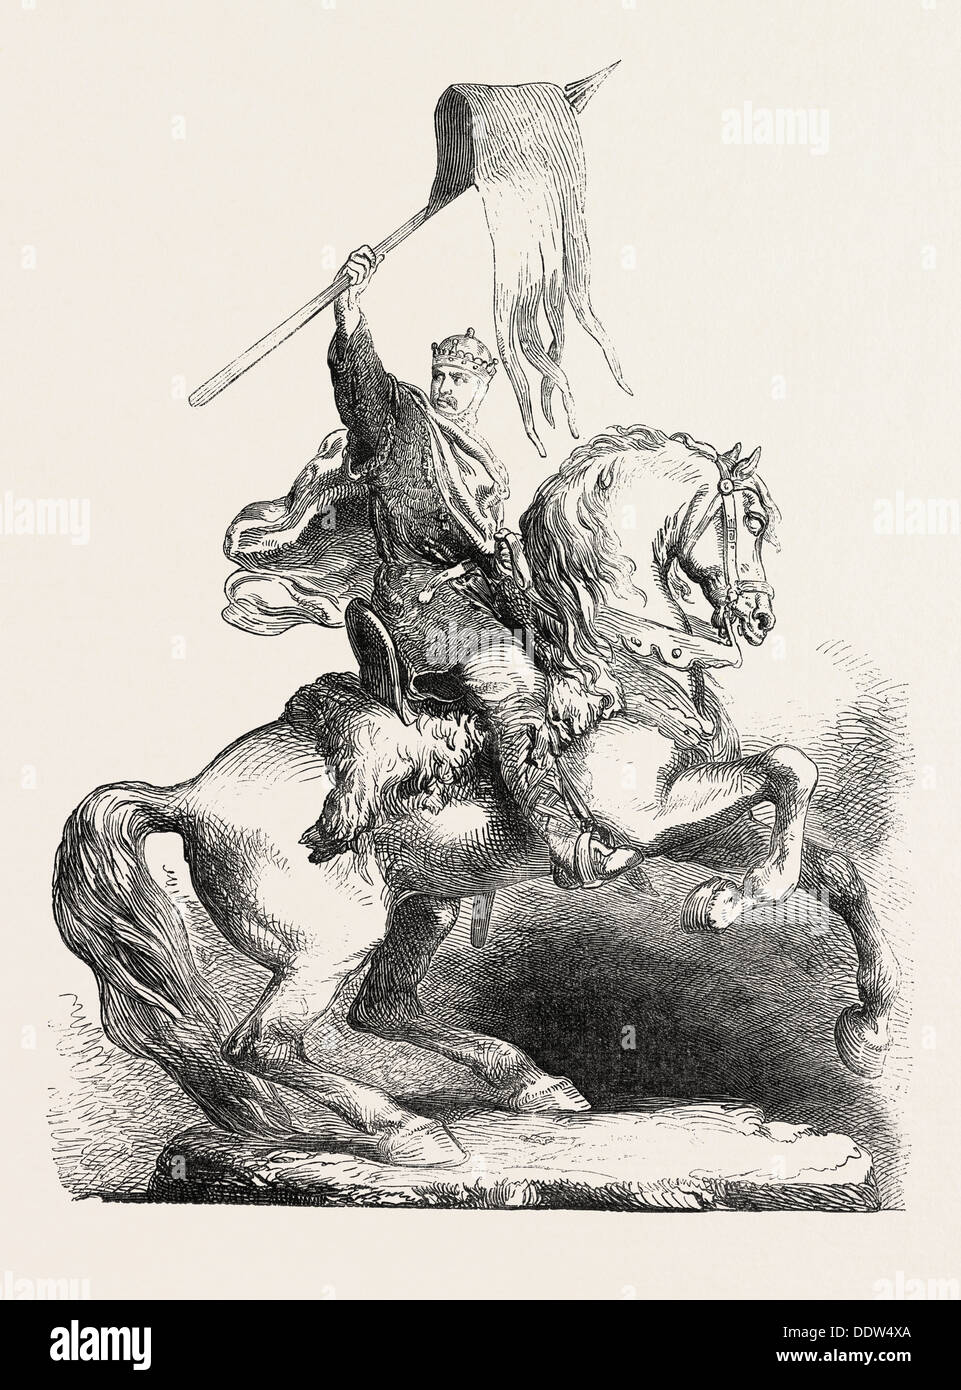 STATUE OF WILLIAM THE CONQUEROR, AT FALAISE - Stock Image